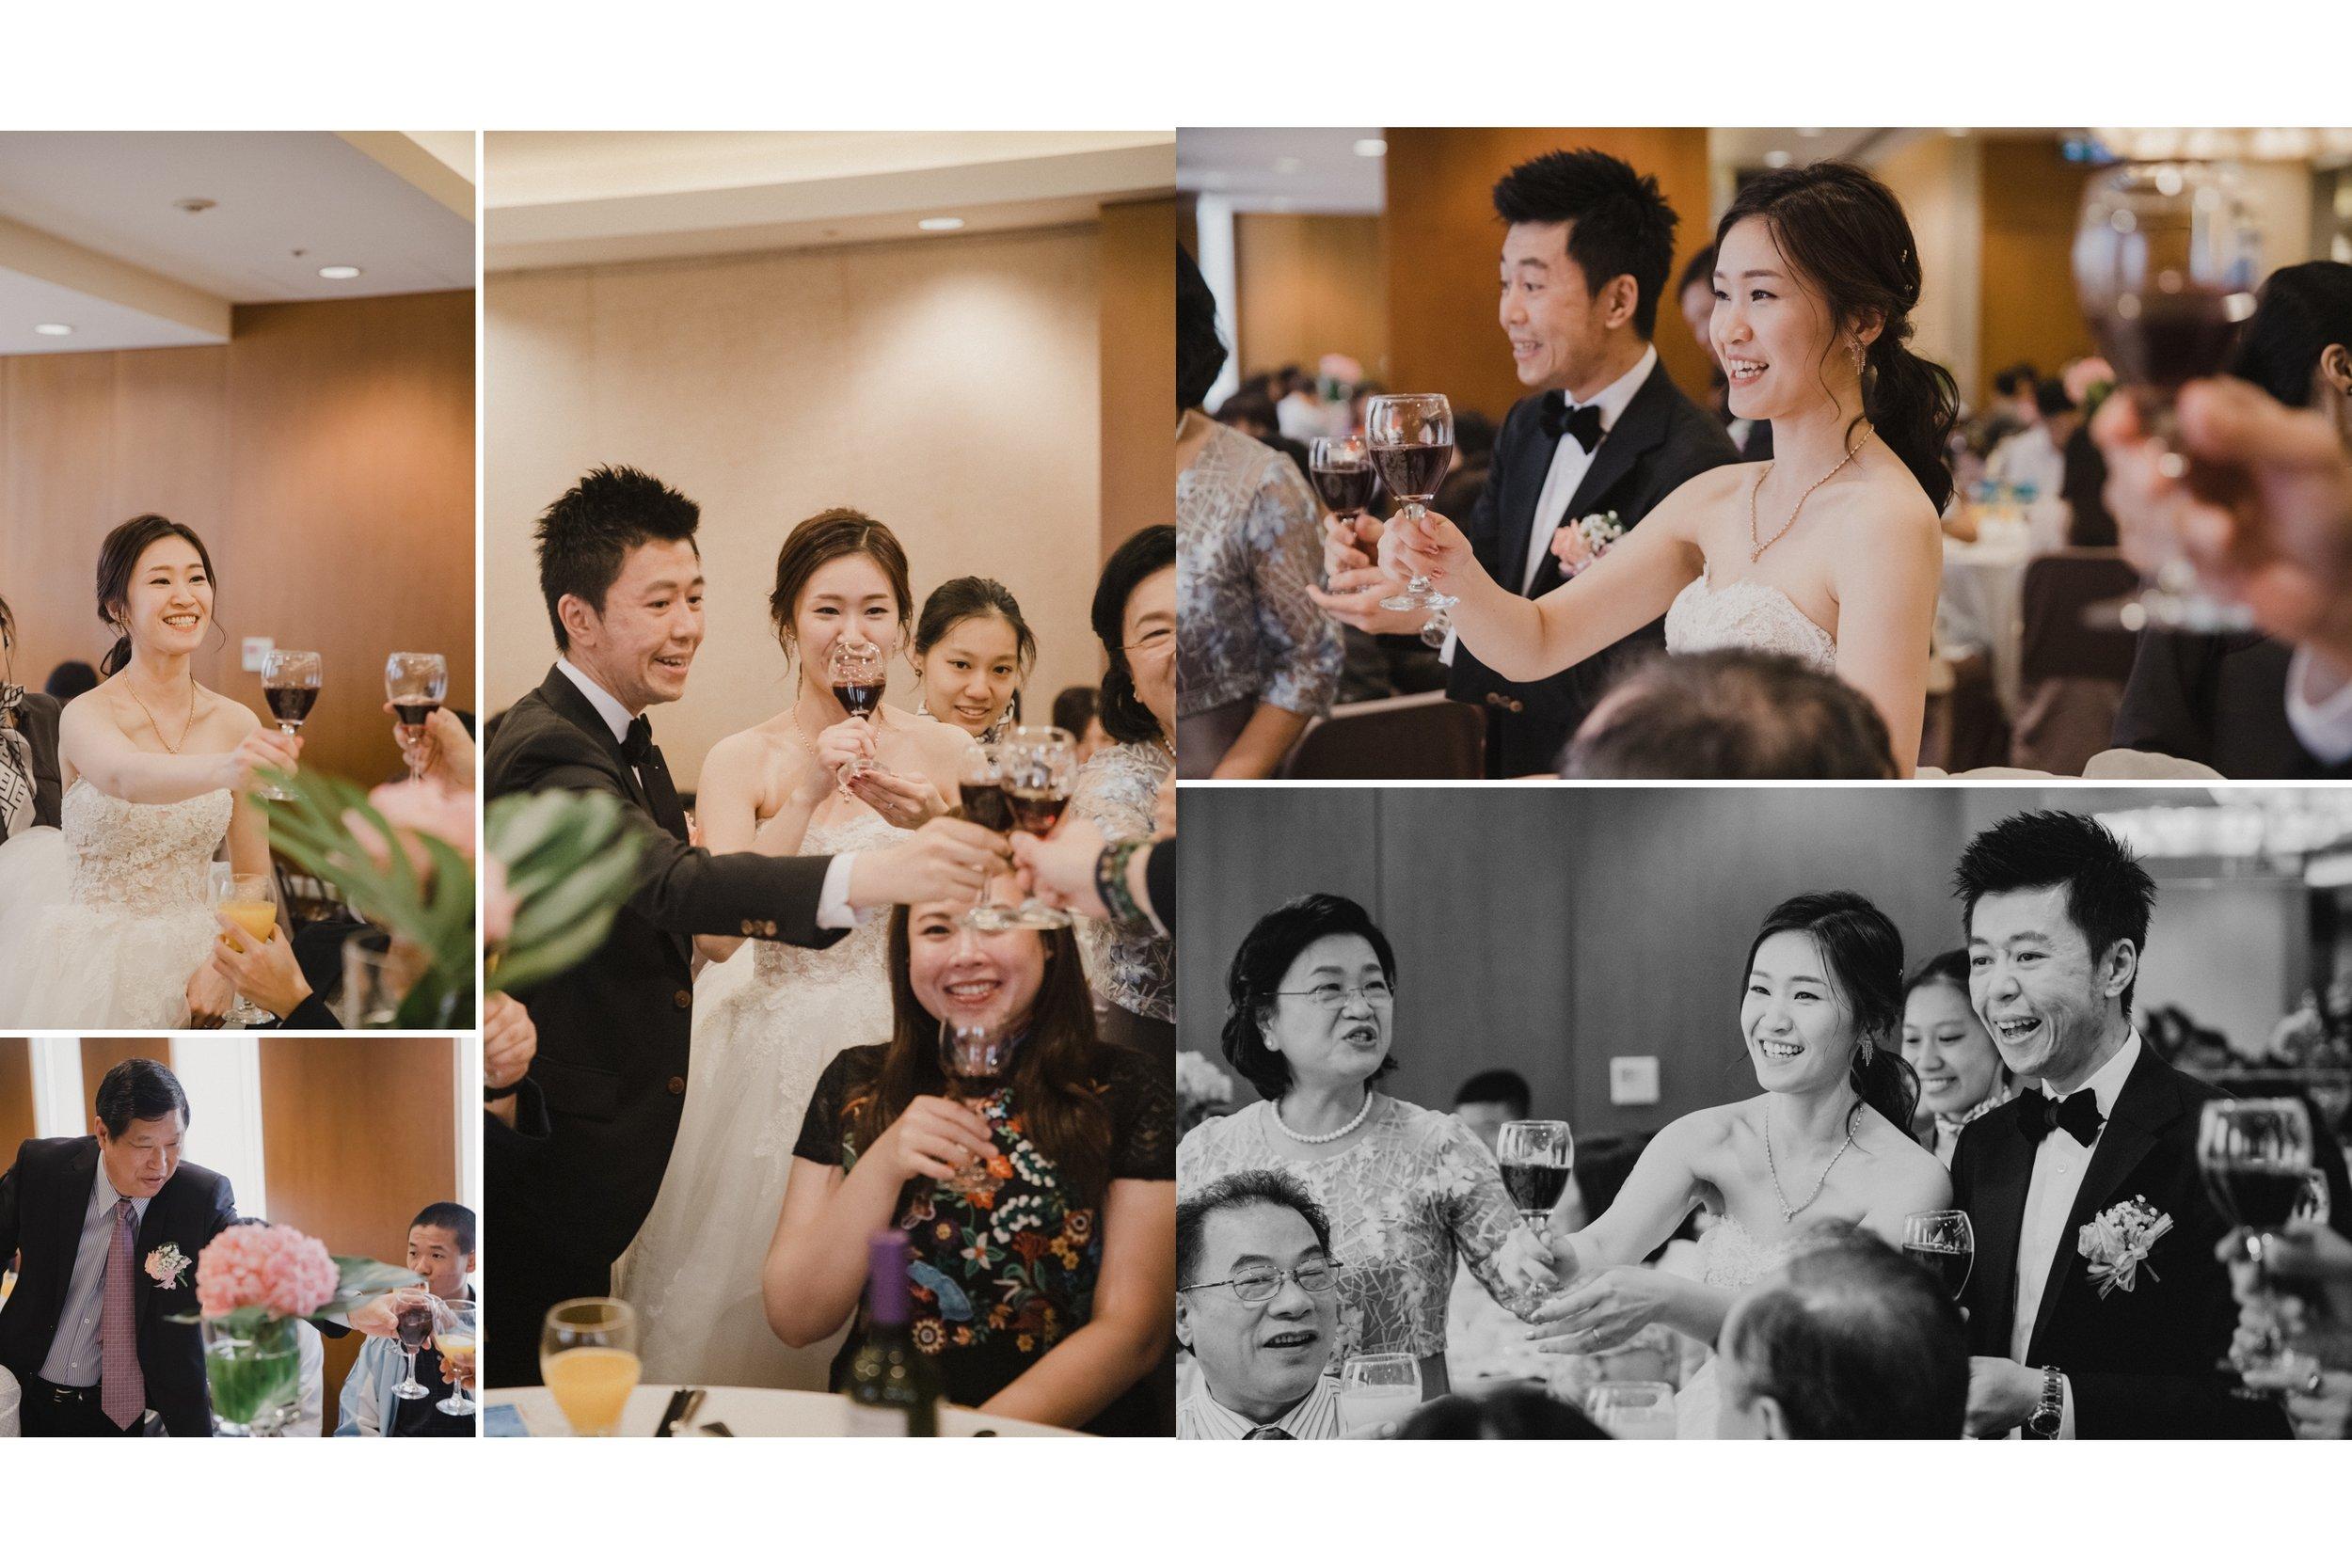 wedding-caridee-oscar-lunch-ambassador-hsinchu-結婚午宴-新竹國賓_122.jpg